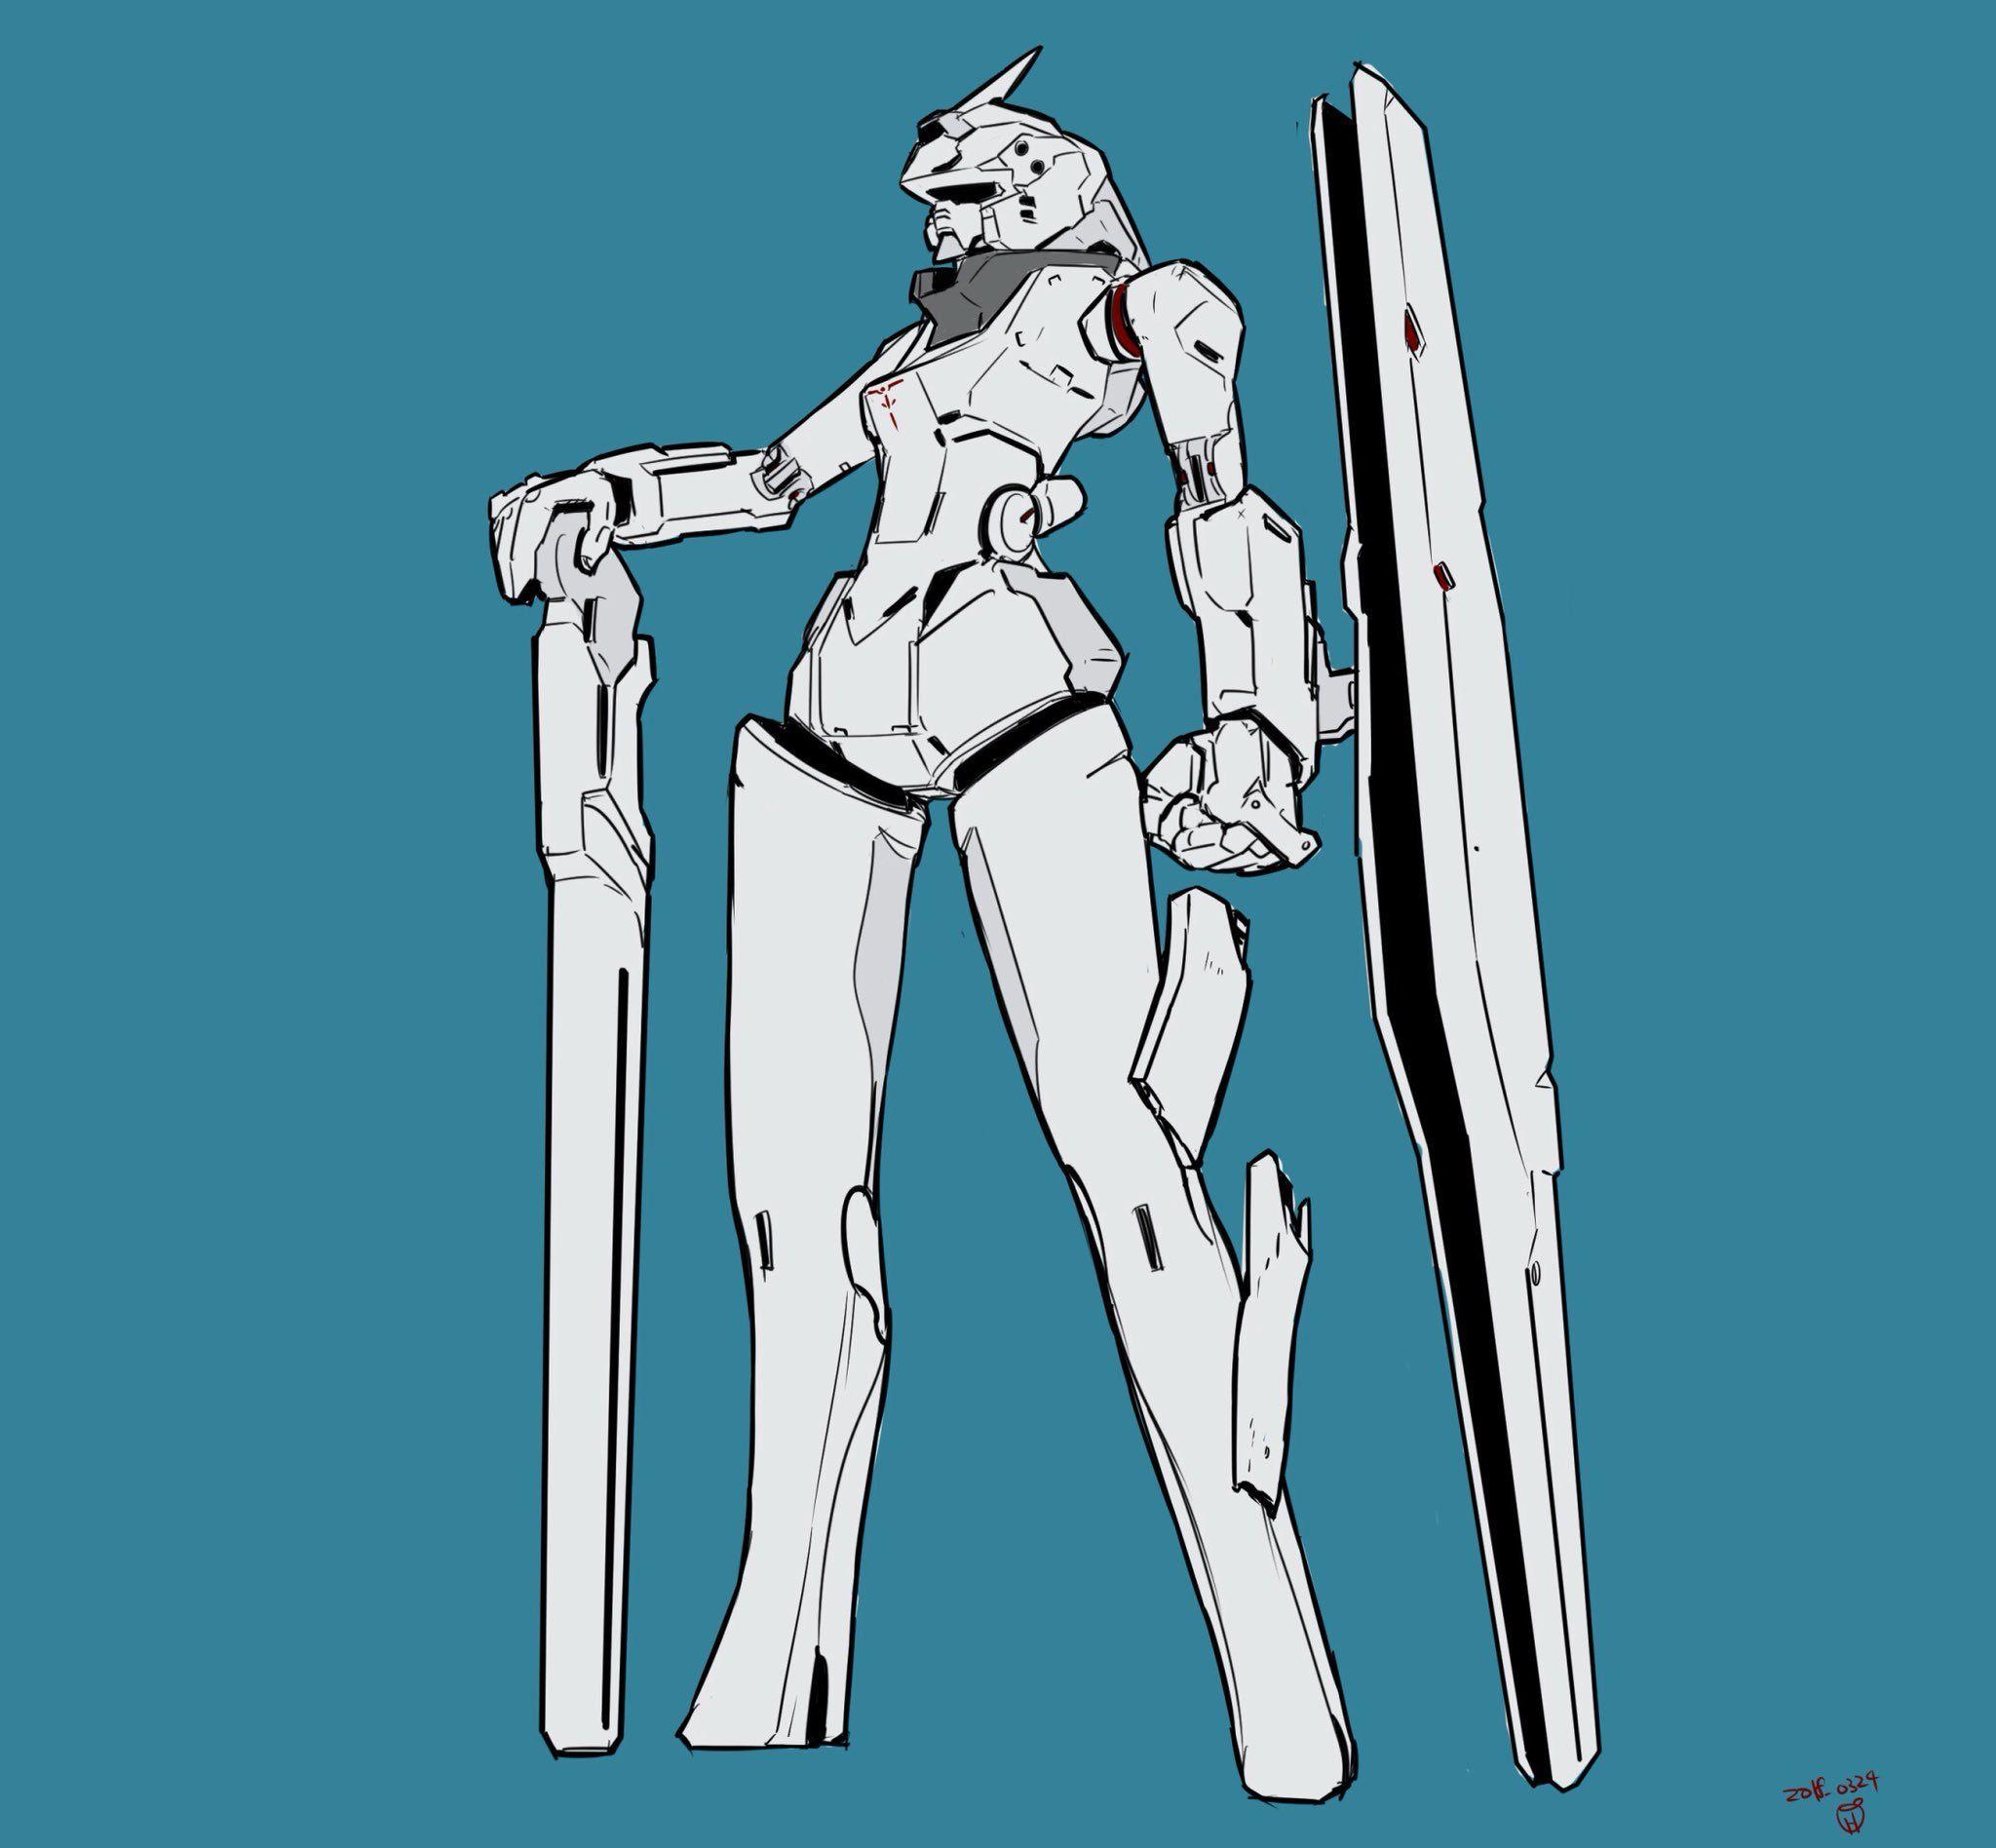 moi on twitter humanoid sketch twitter mecha